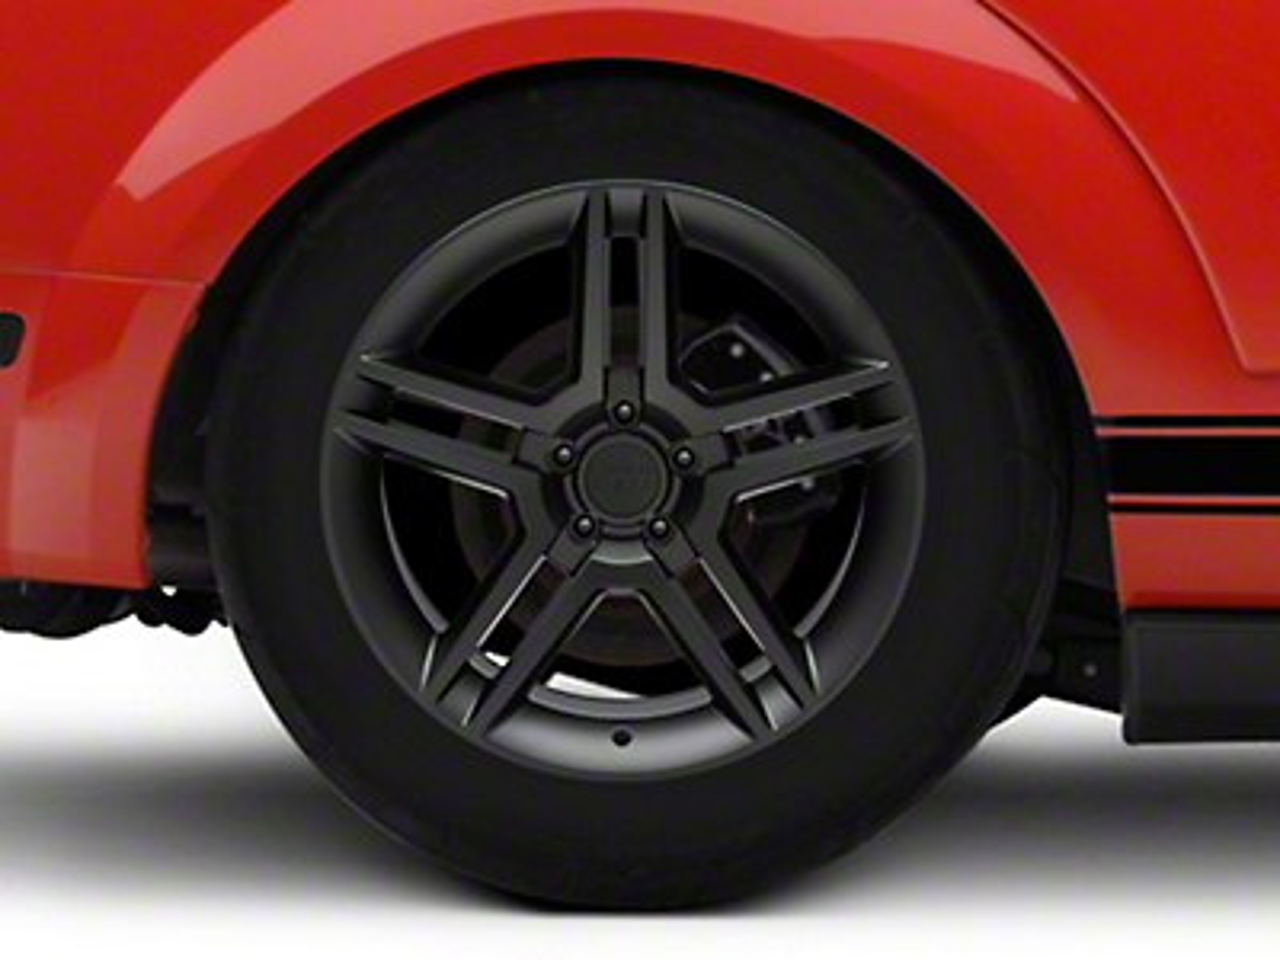 2010 GT500 Style Matte Black Wheel - 18x10 (05-14 All)